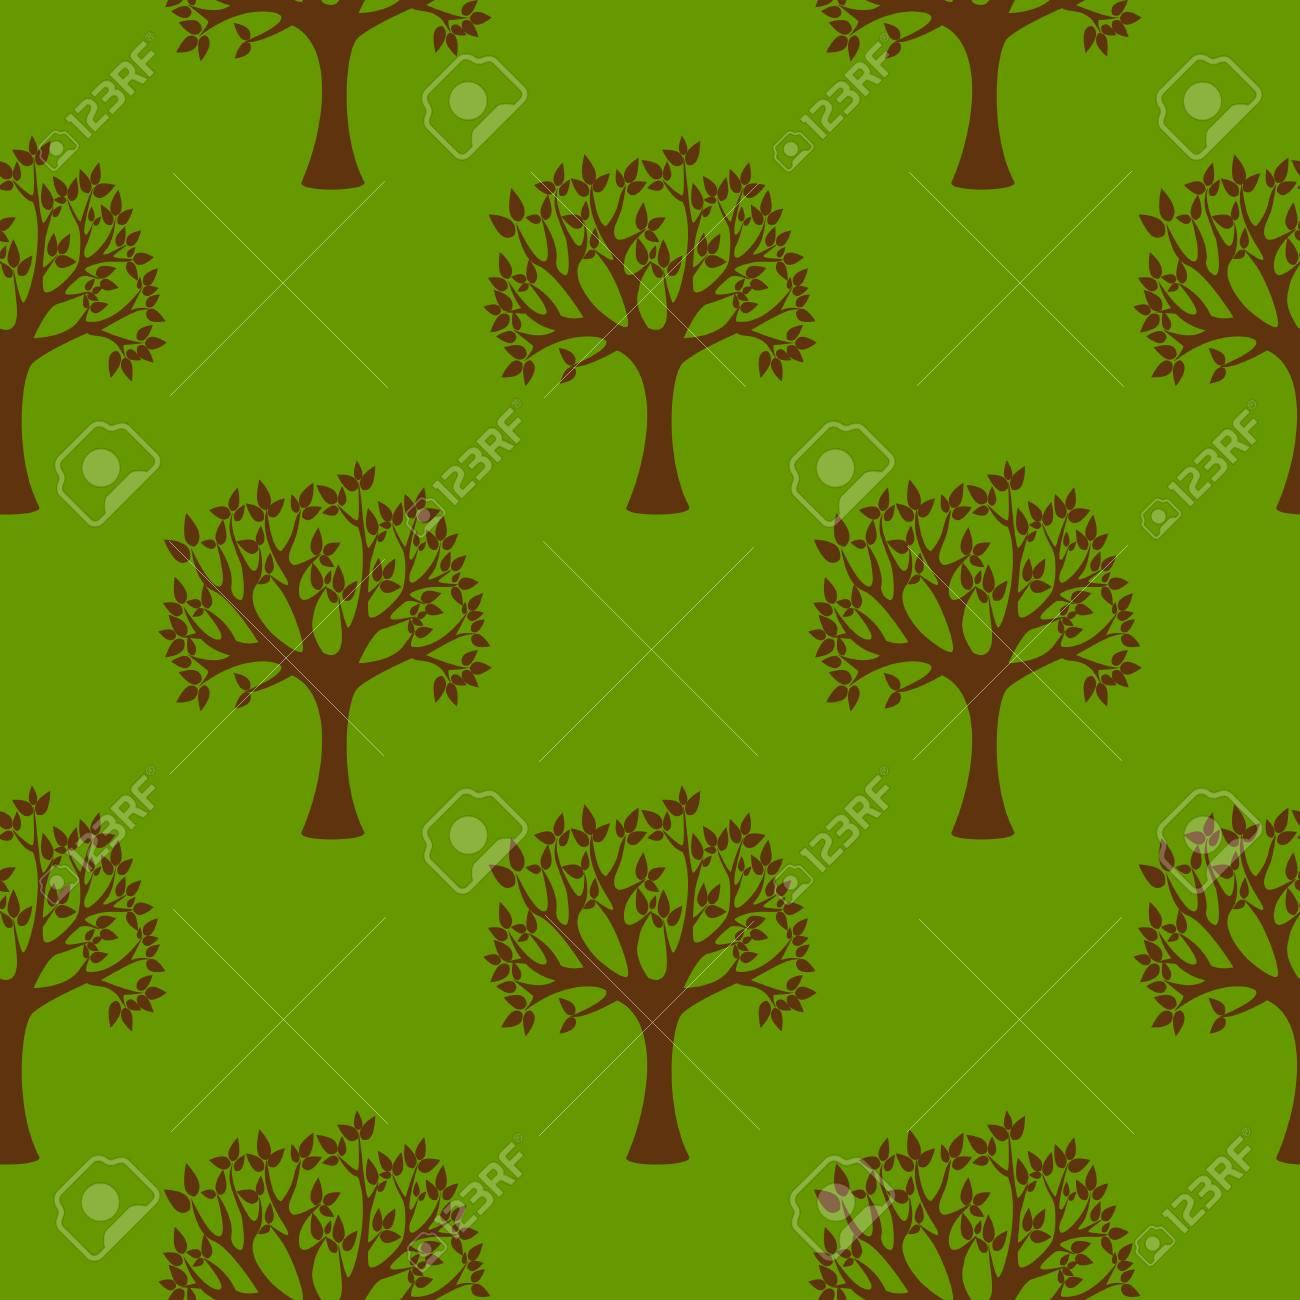 Abstract Grunge Baum Natur Umwelt Oko Okologie Nahtlose Muster